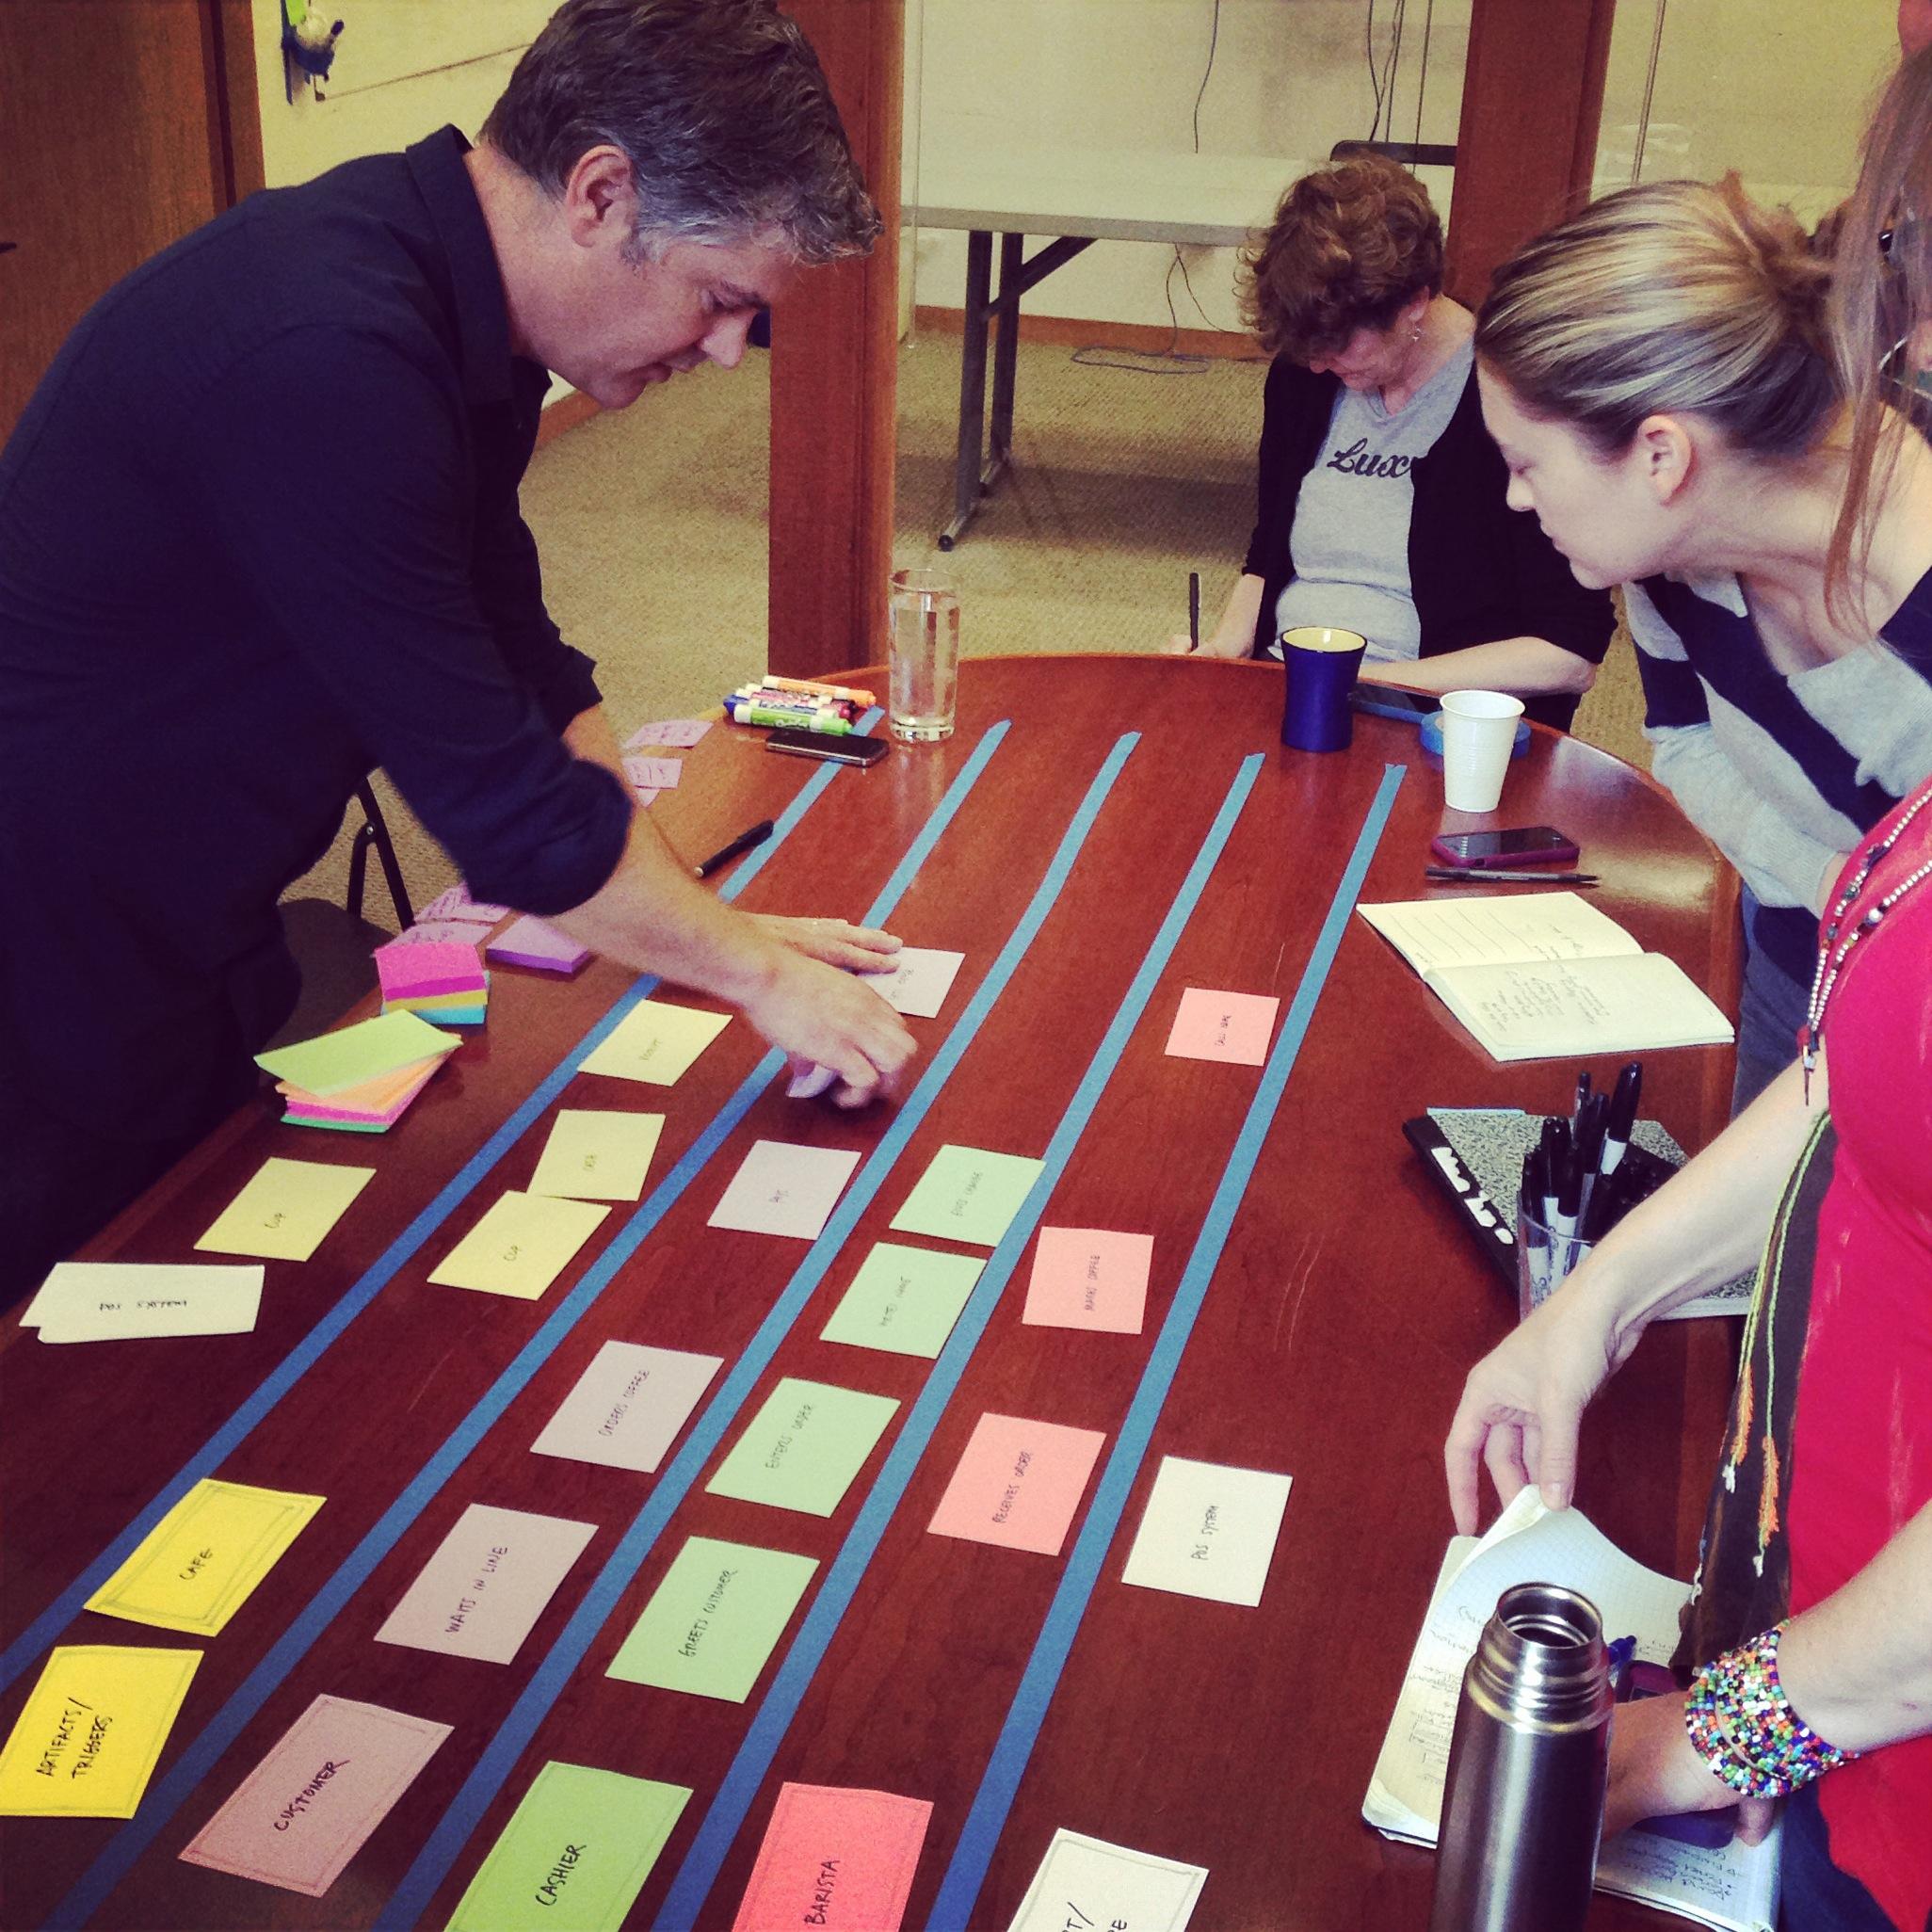 David Hendee facilitating an Experience Map activity